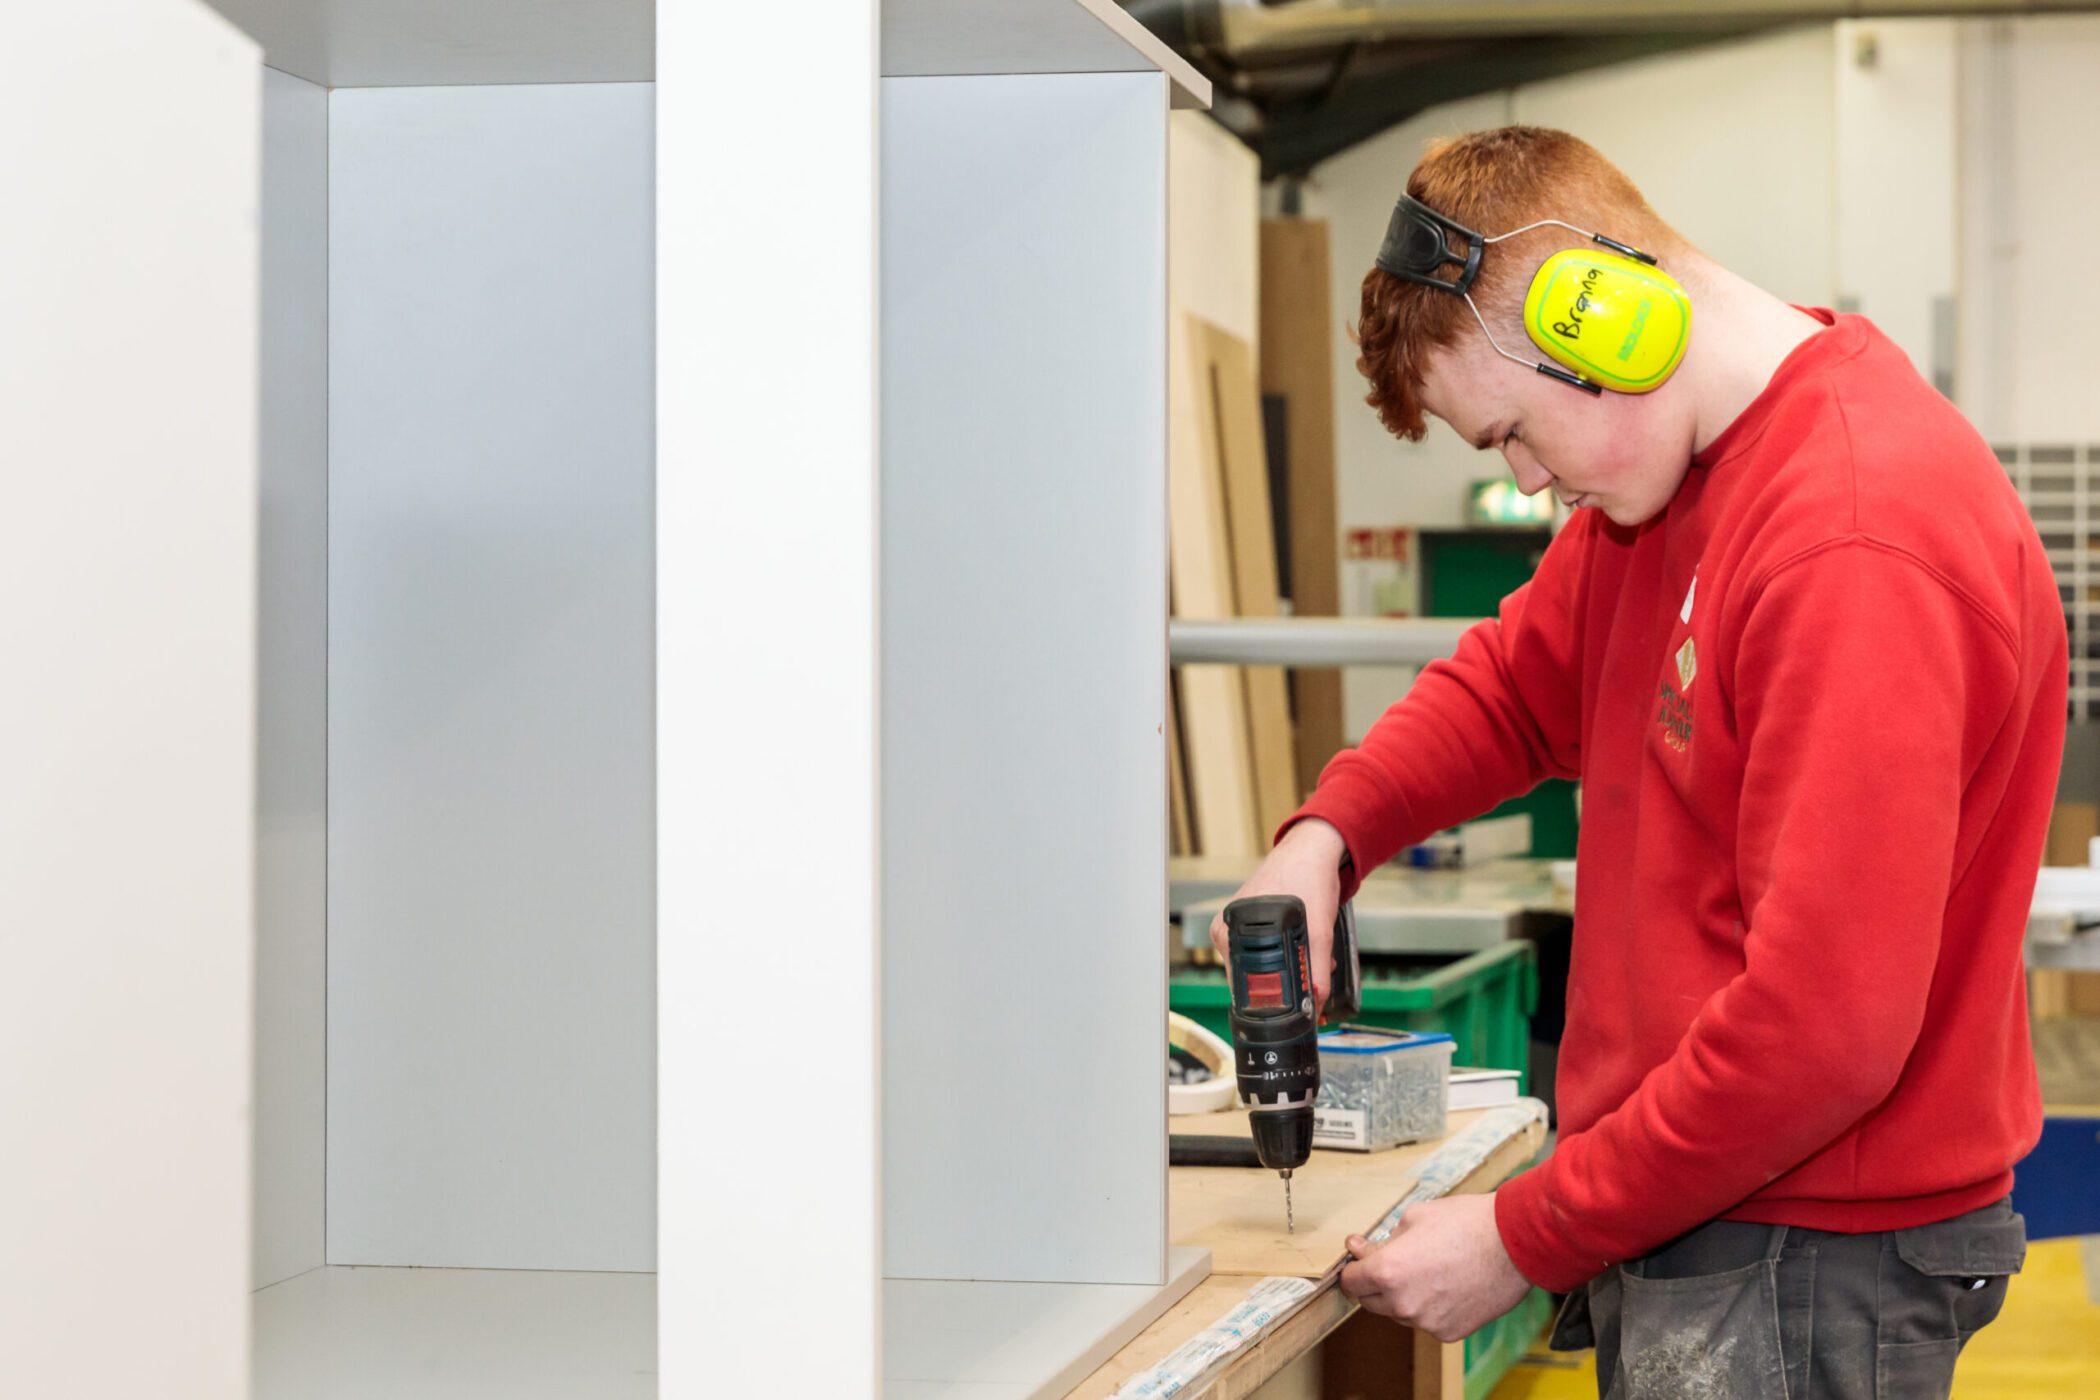 Apprentice Carpenter – London Based